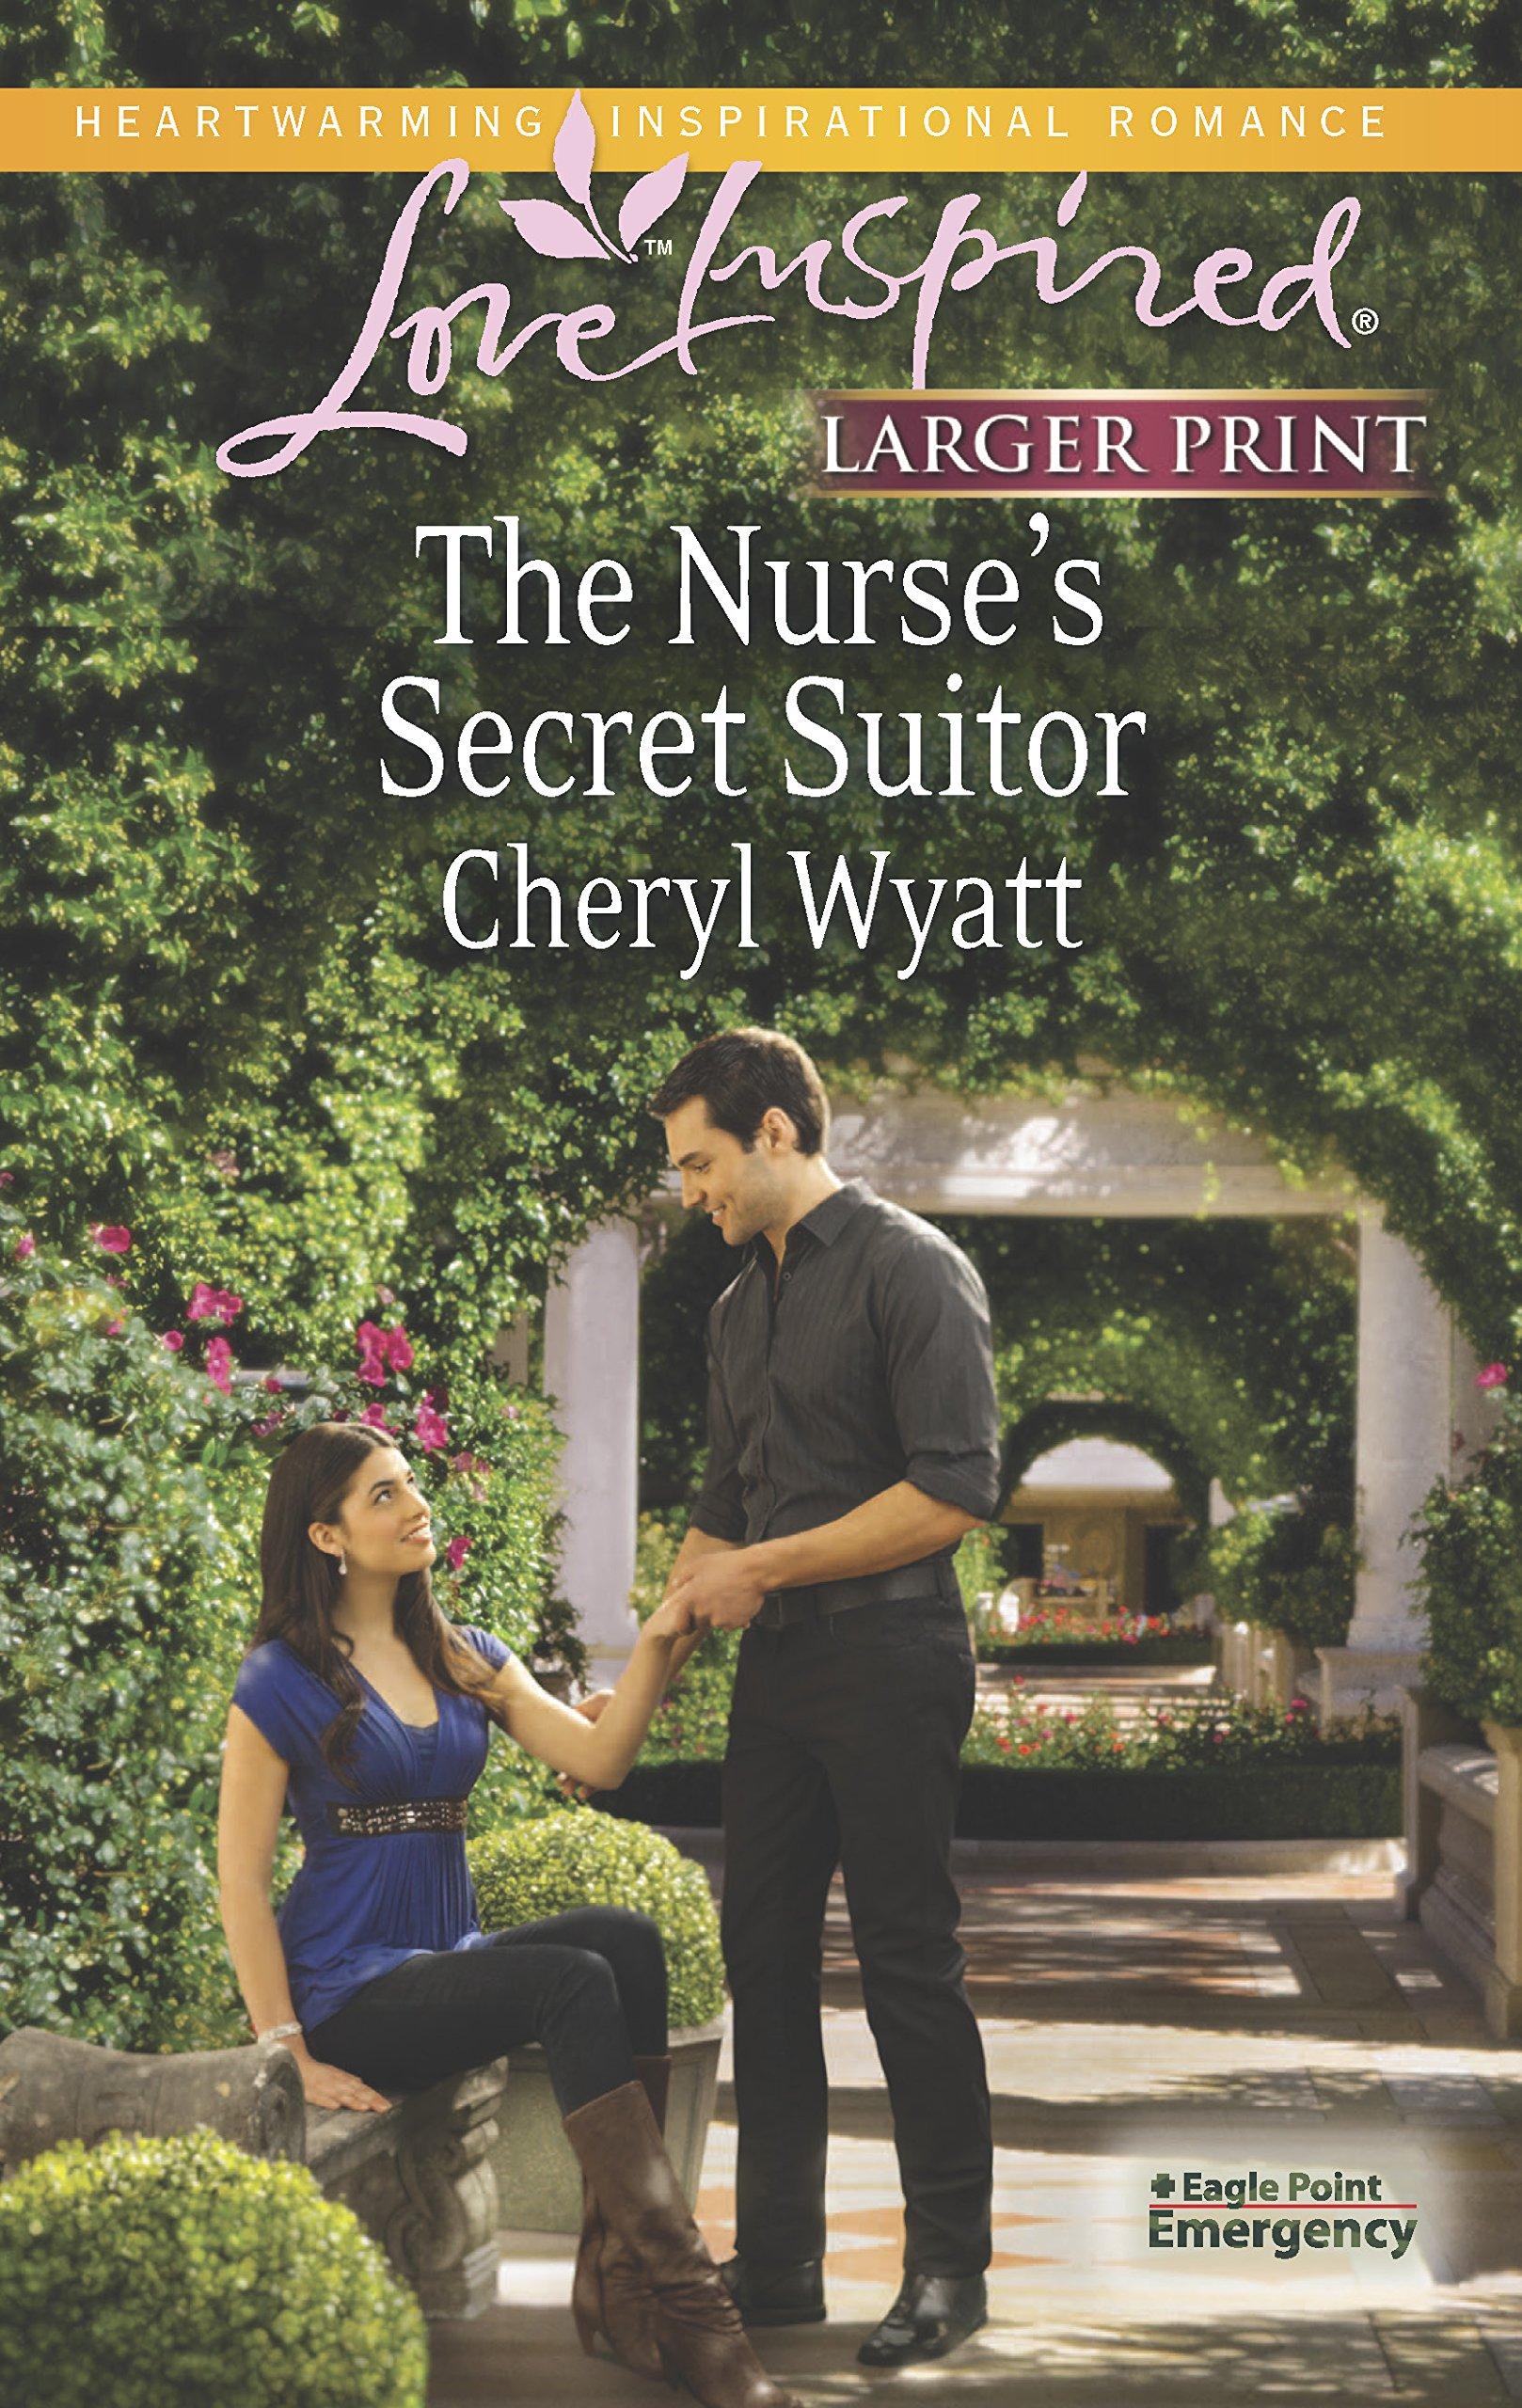 The Nurse's Secret Suitor (Eagle Point Emergency) ebook